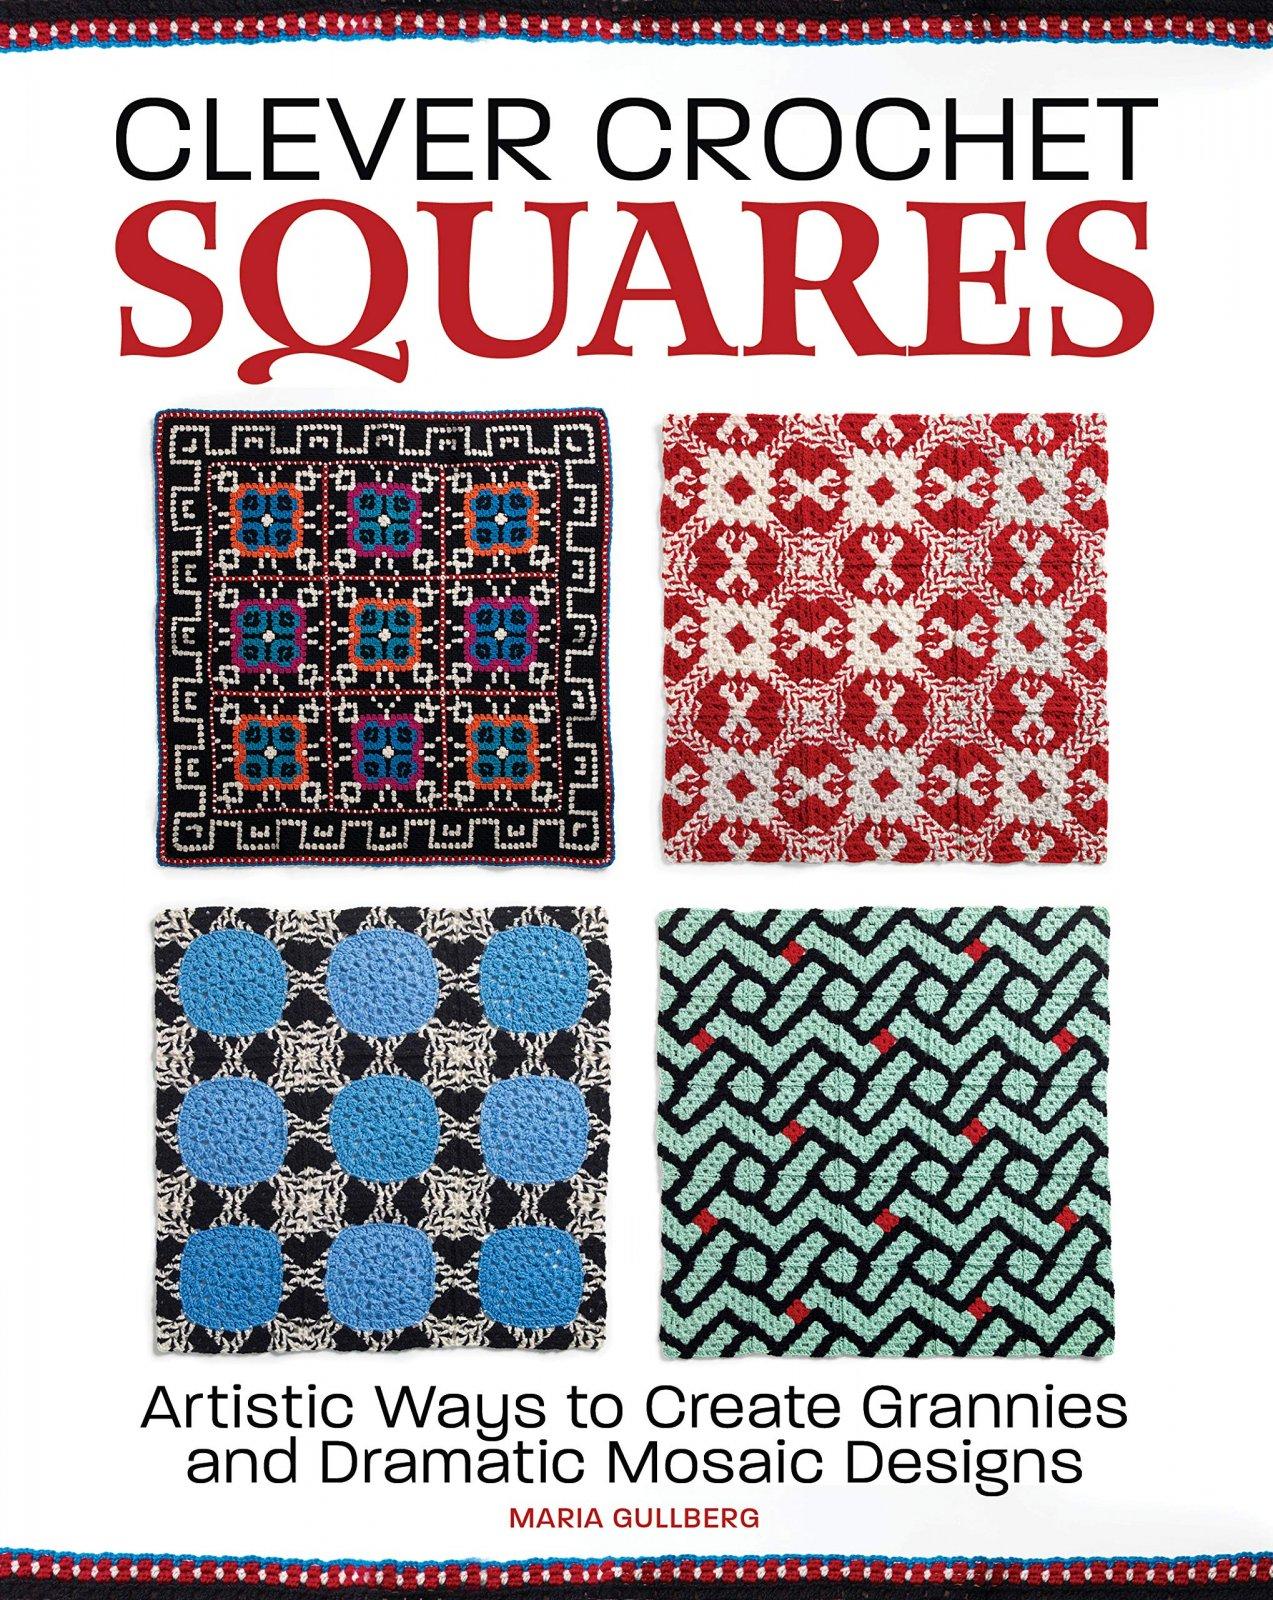 BK - Clever Crochet Squares